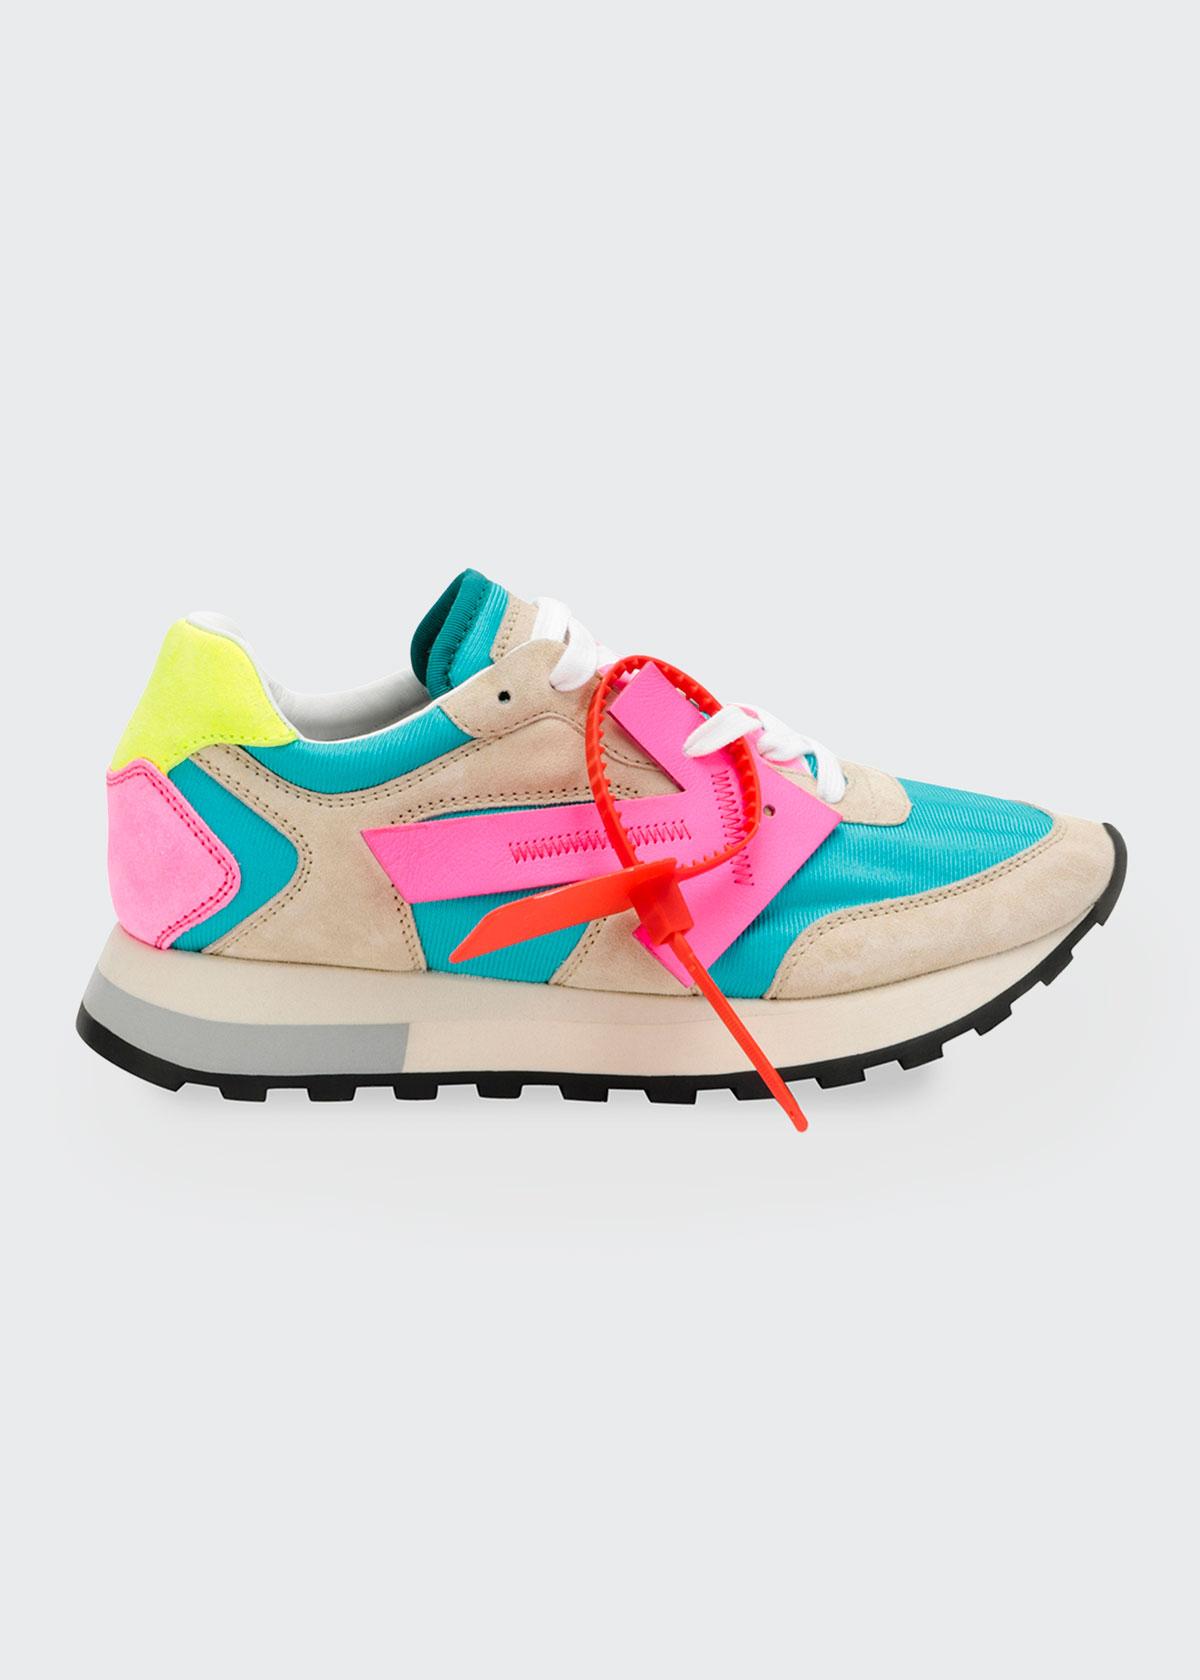 Off-White HG Colorblock Runner Sneakers